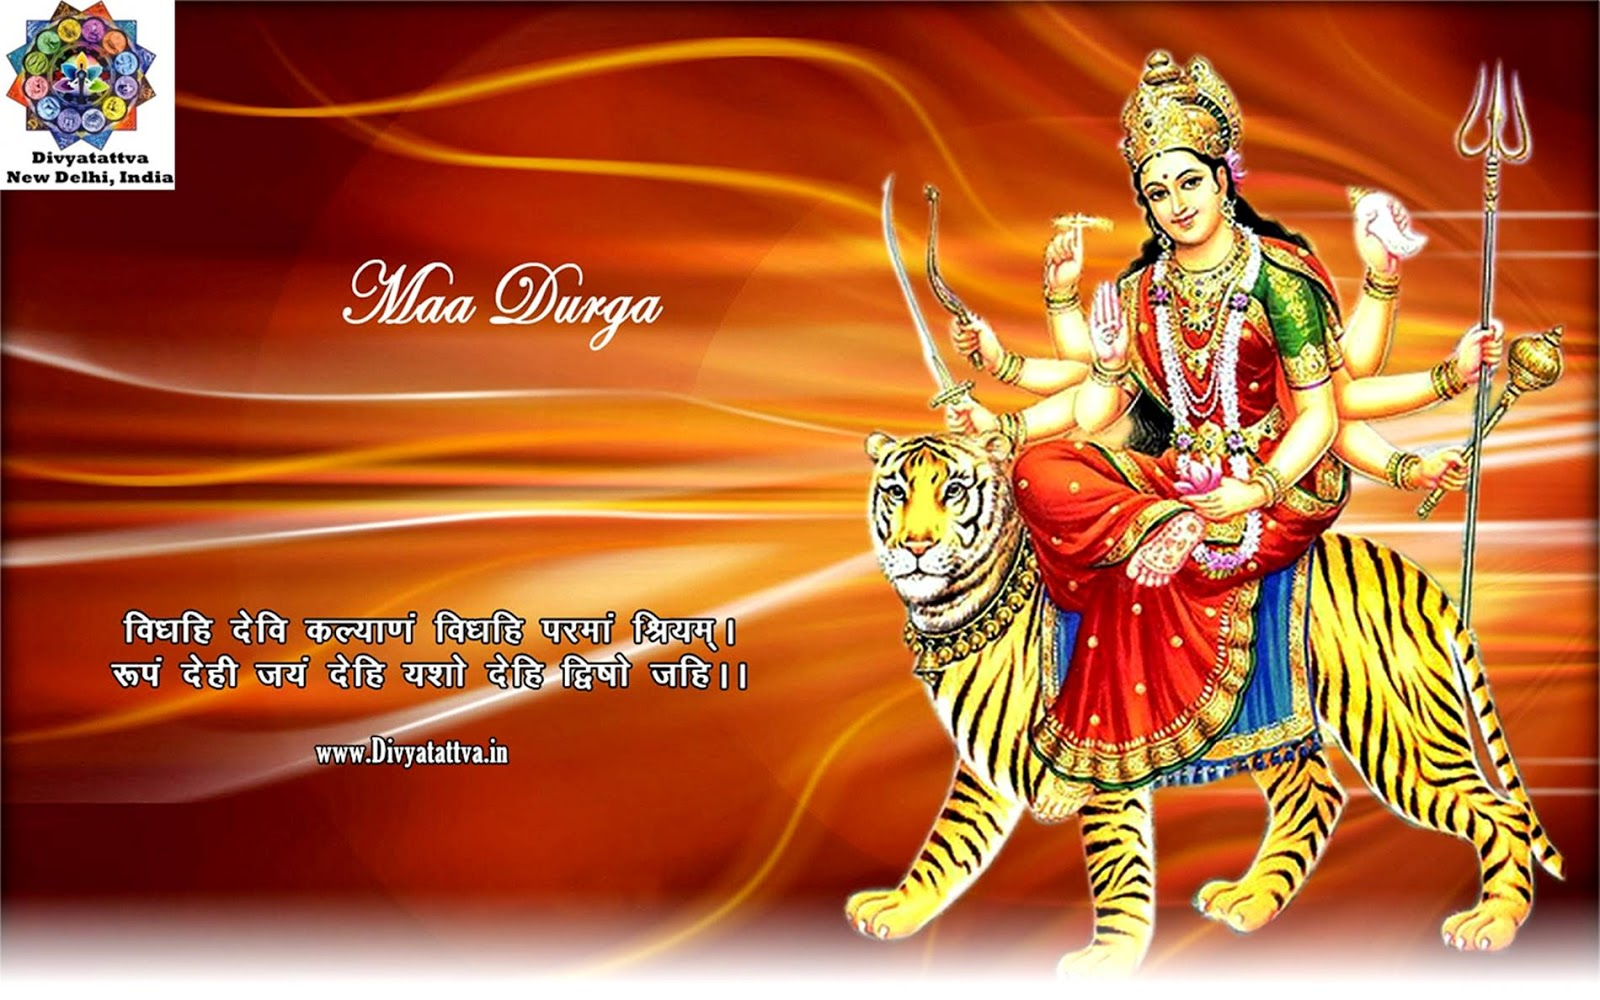 Mata Rani Ki Photo Download Durga Maa Images Beautiful Goddess Durga 1600x1000 Download Hd Wallpaper Wallpapertip